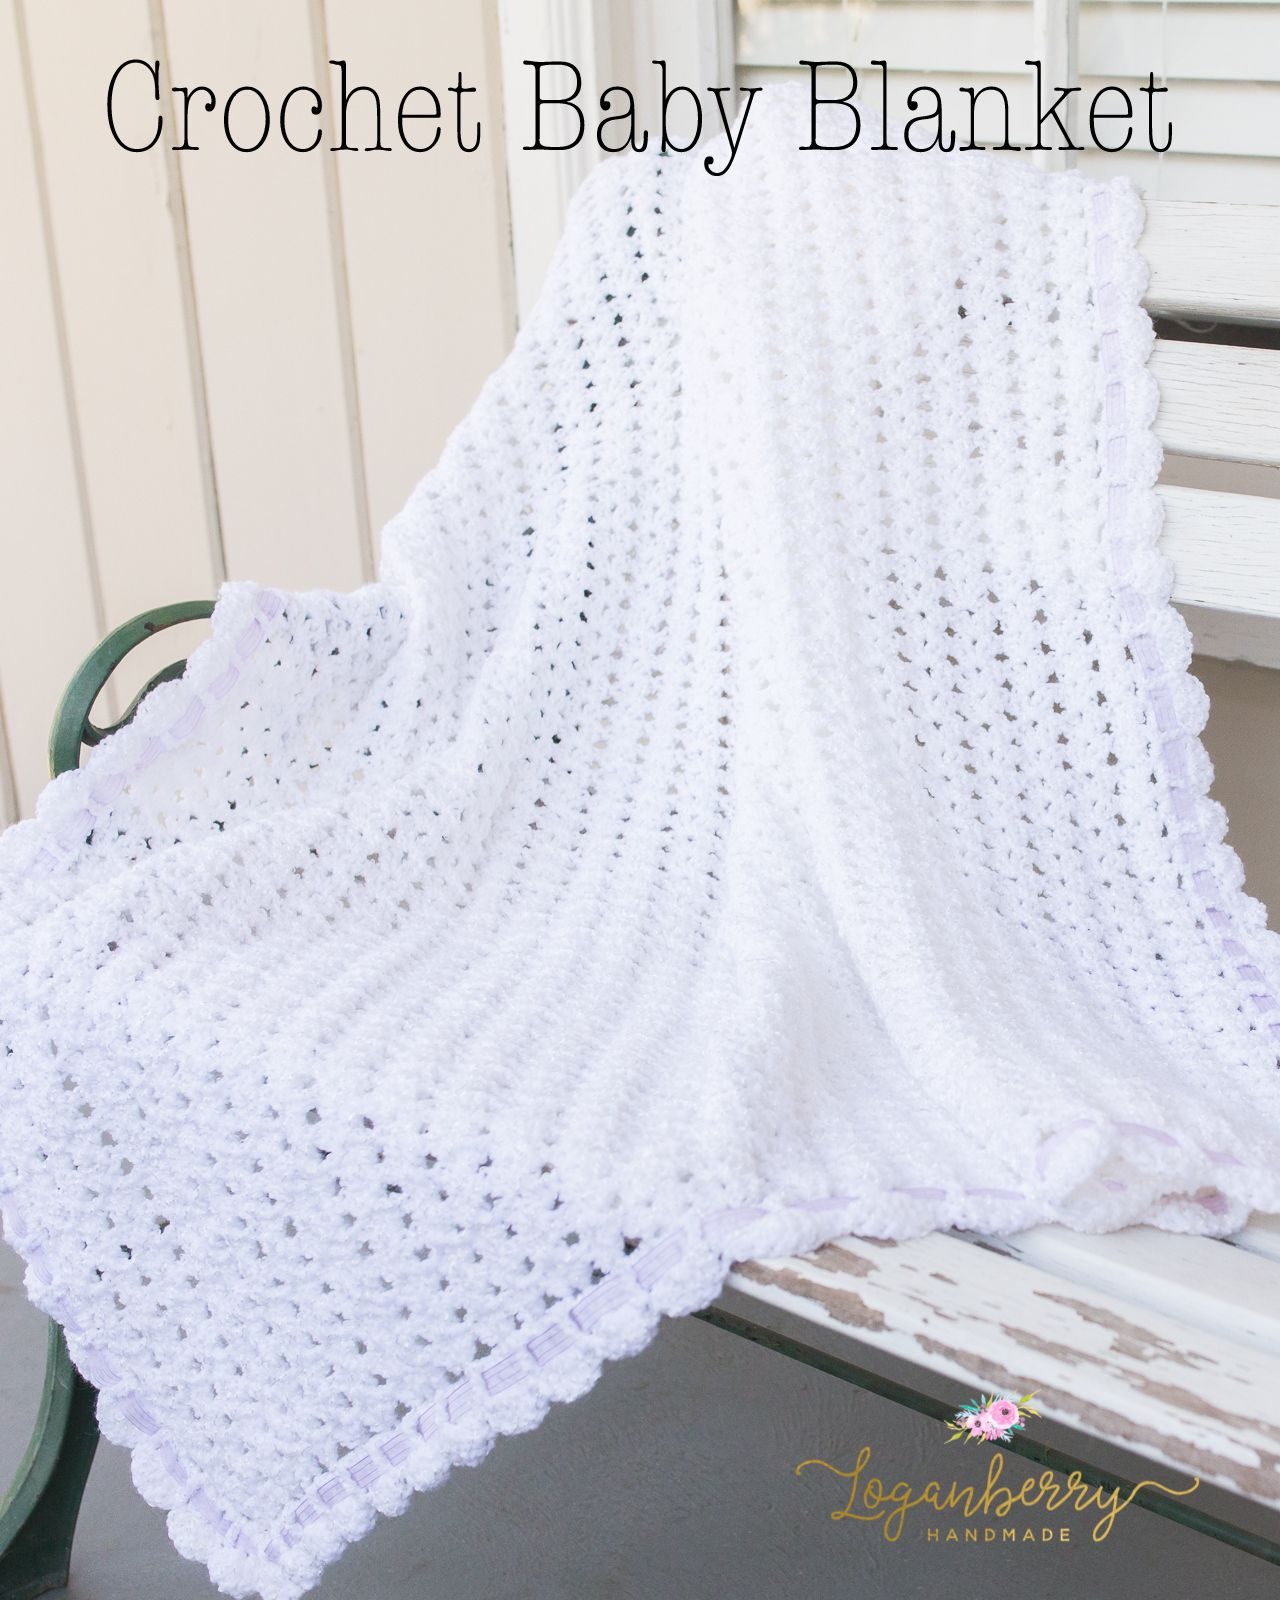 crochet+baby+blanket+with+free+pattern,+free+crochet+pattern+baby+ ...